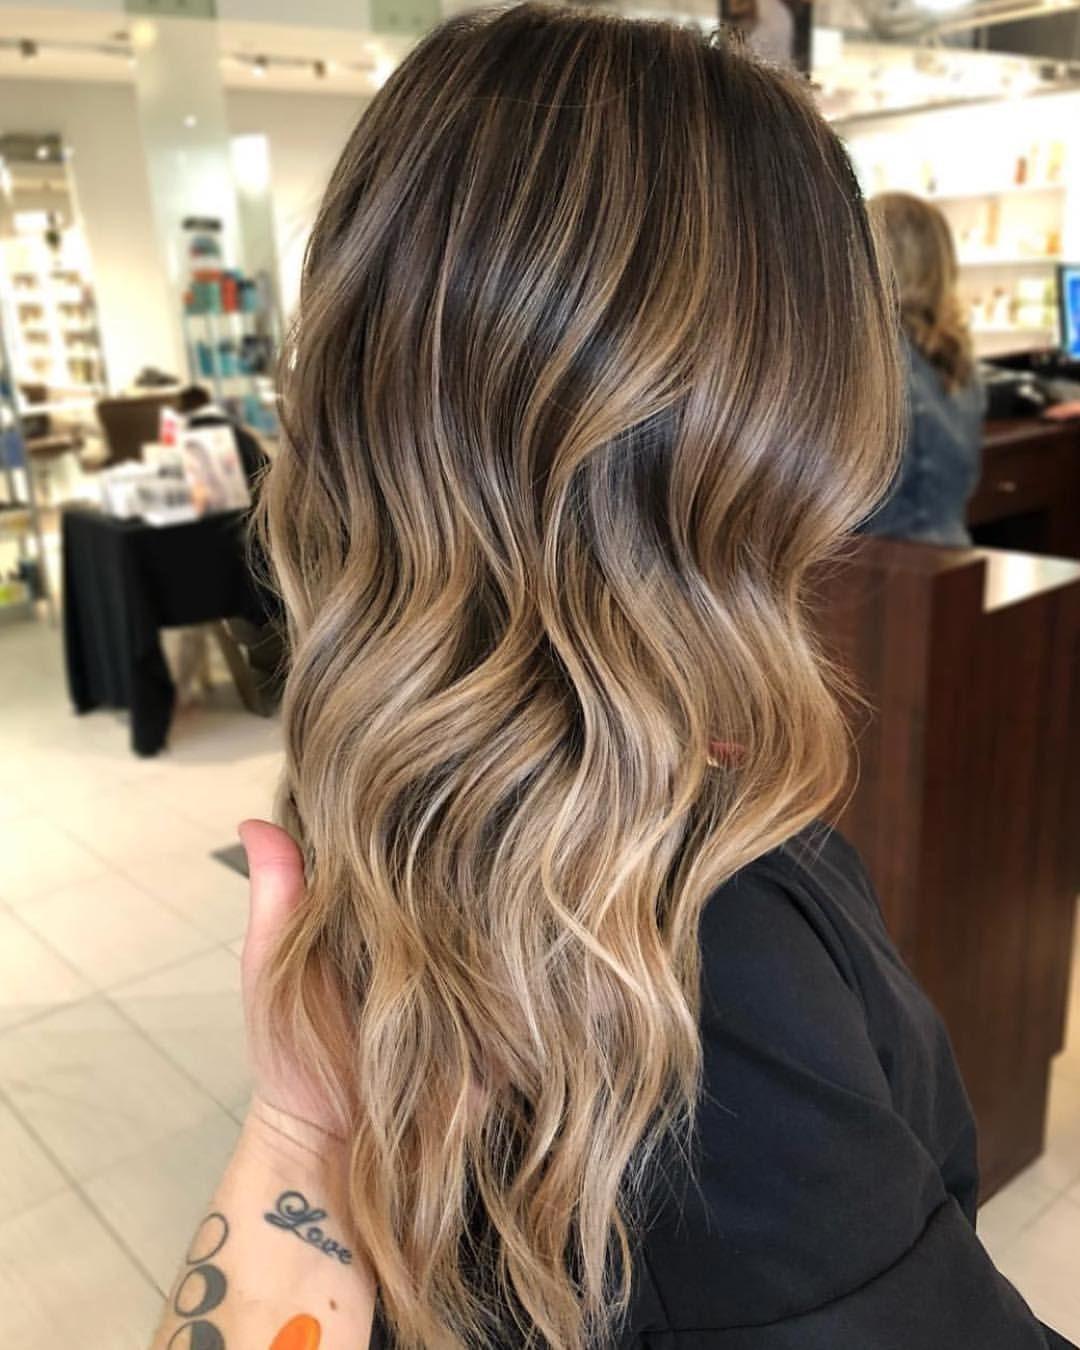 43 Pretty Women with Balayage Hair Colors – dressip.com